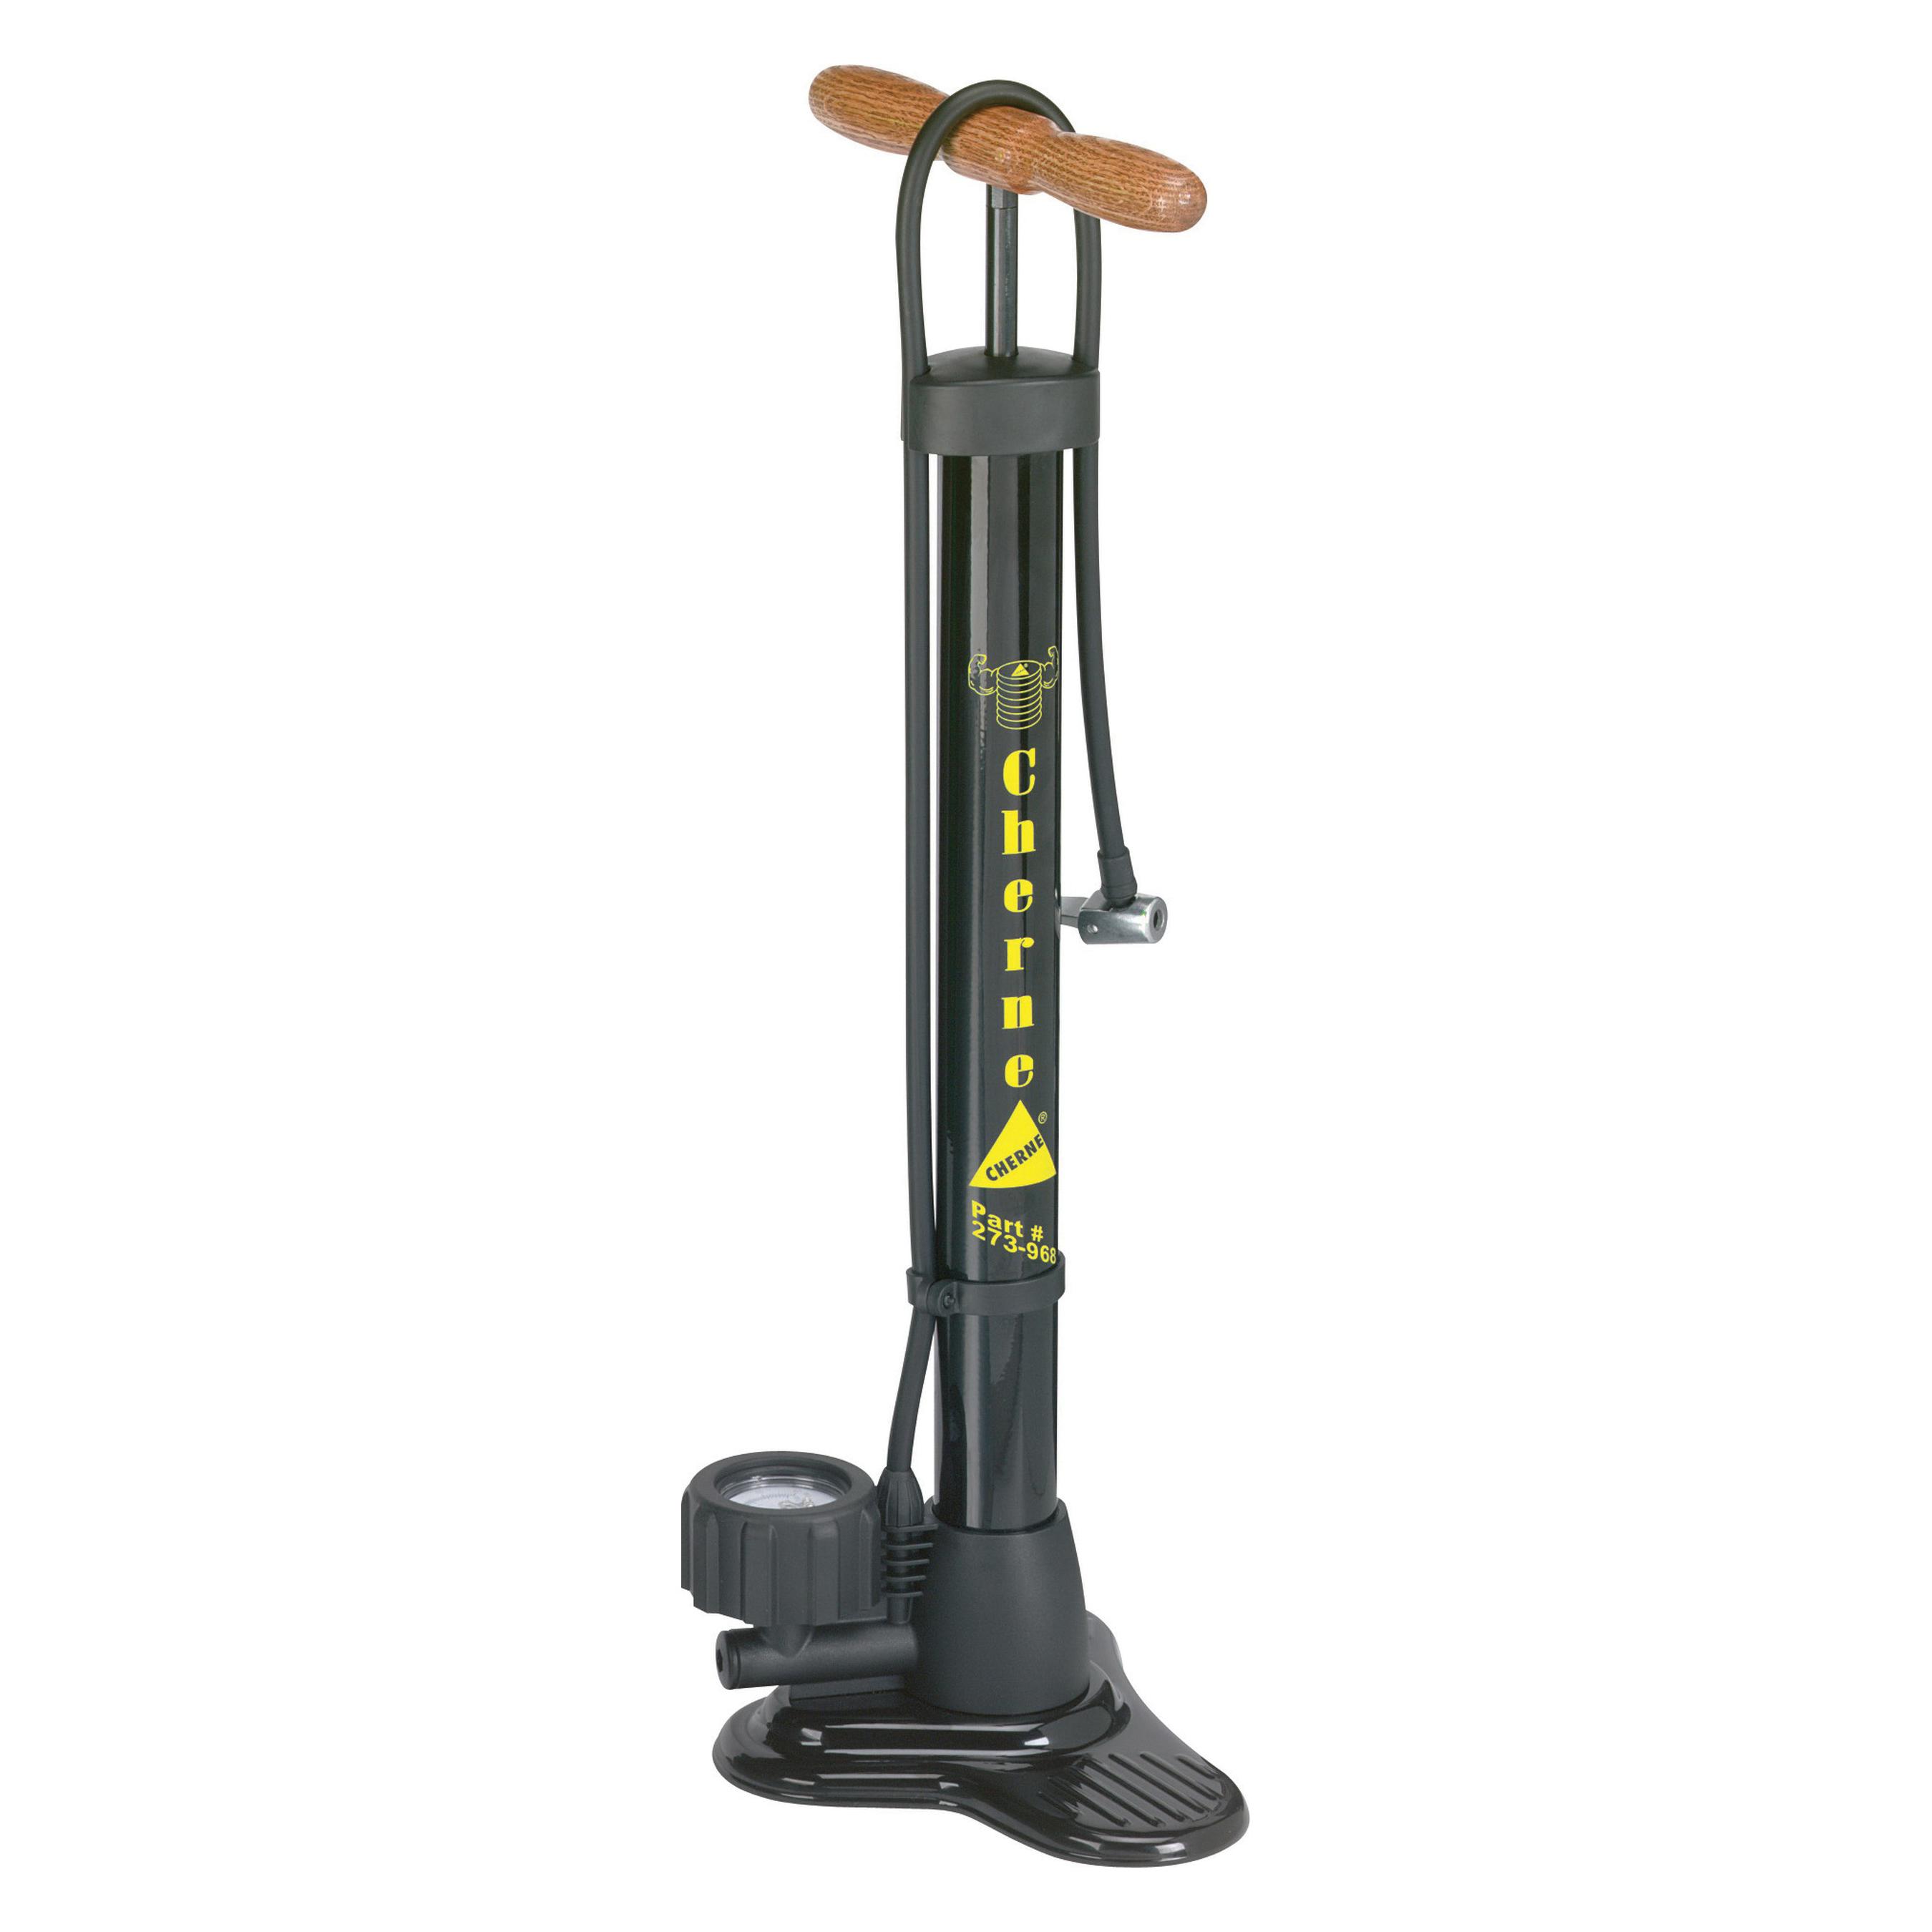 Cherne® Air-Max® Pro 273968 High Volume Test Pump With Gauge